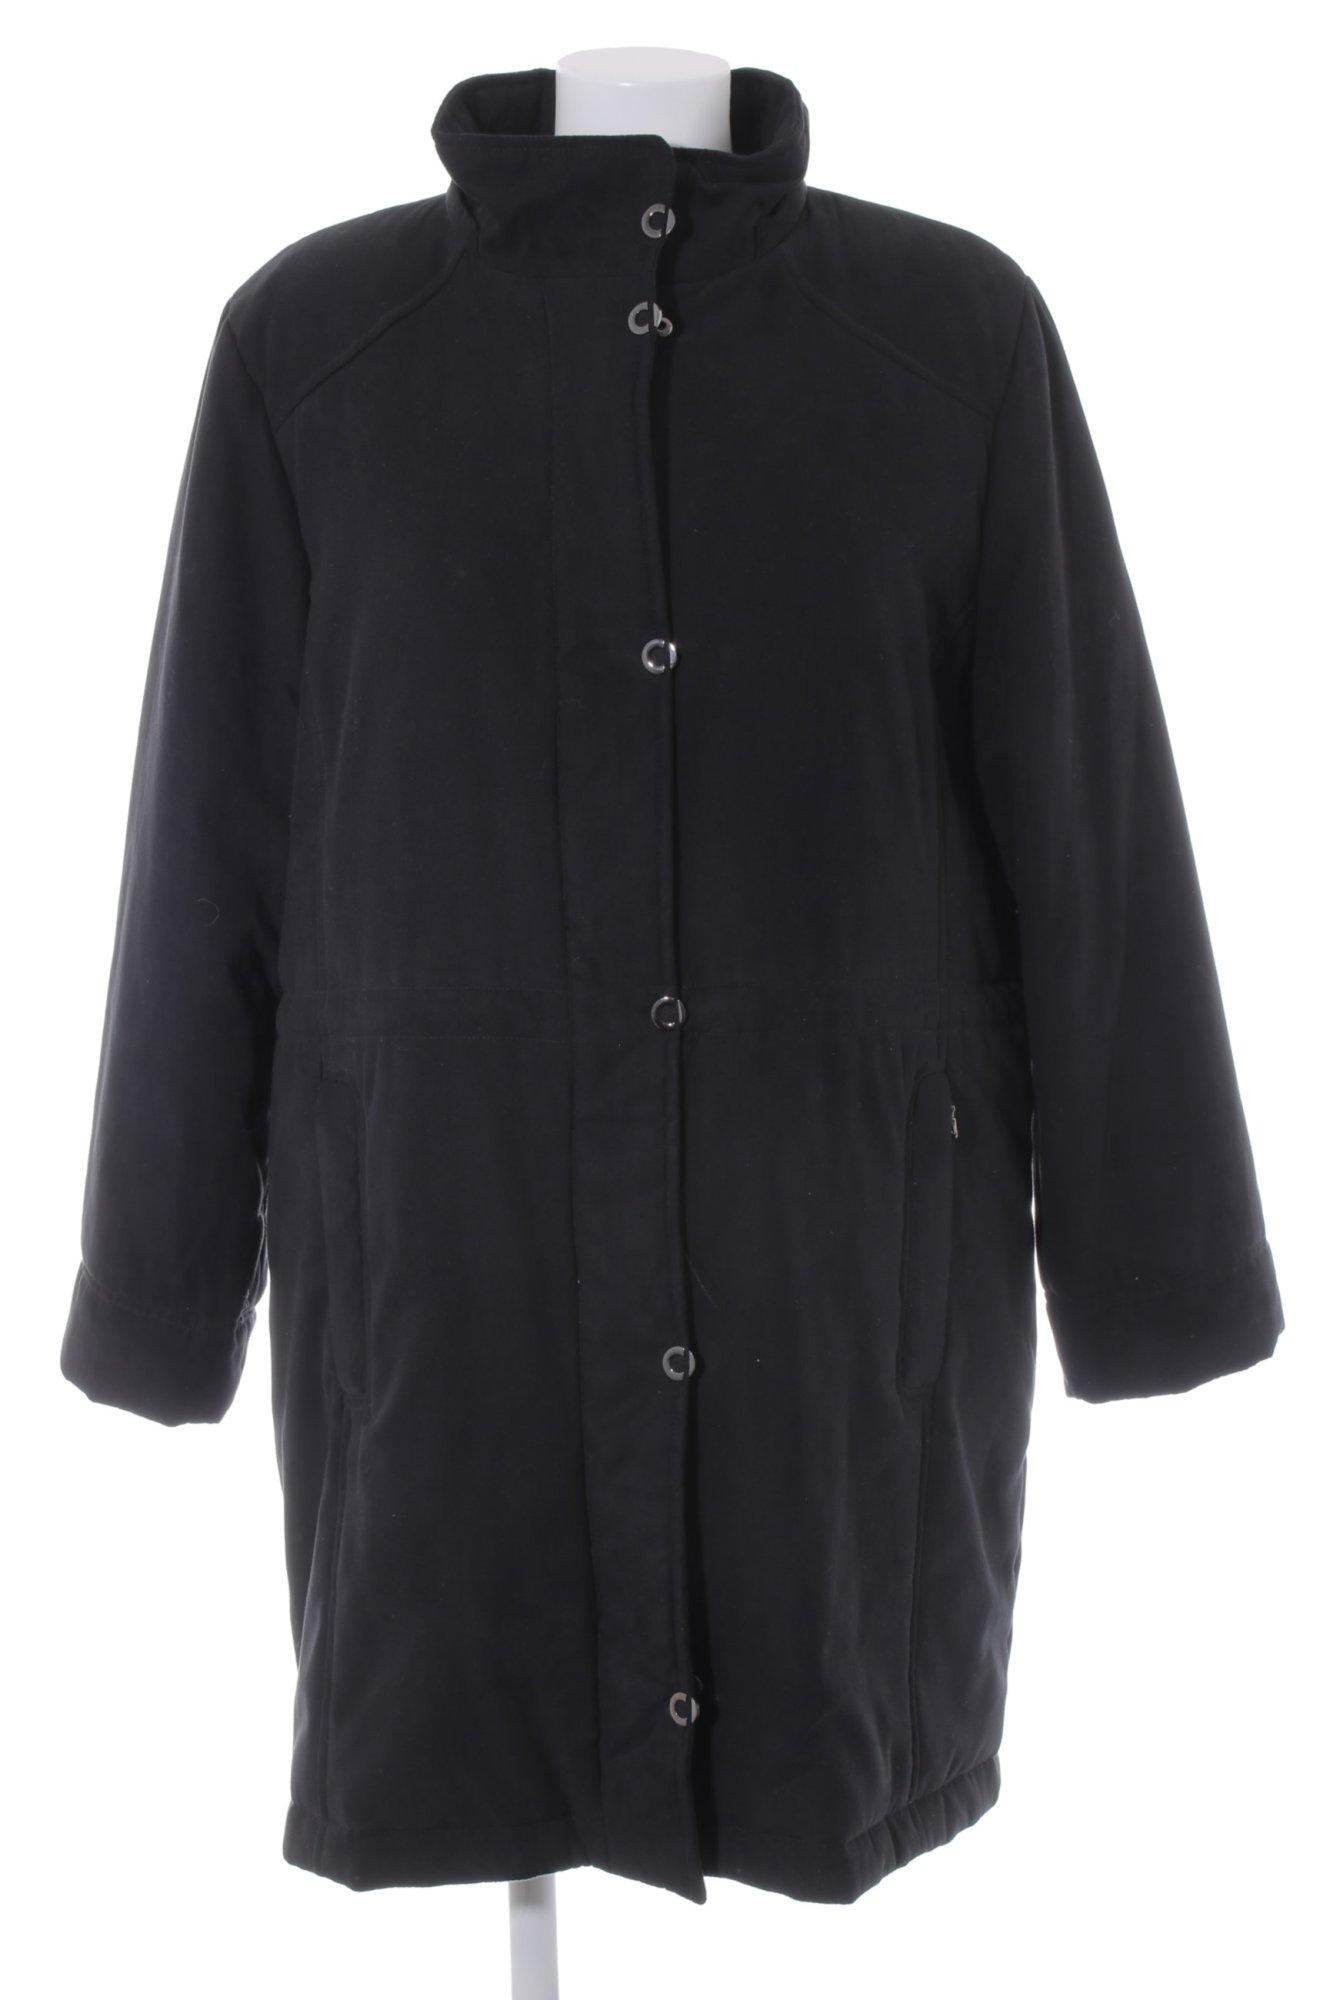 Wintermantel look Schwarz Coat Damen Mantel De 44 Gr Casual Winter qEEar